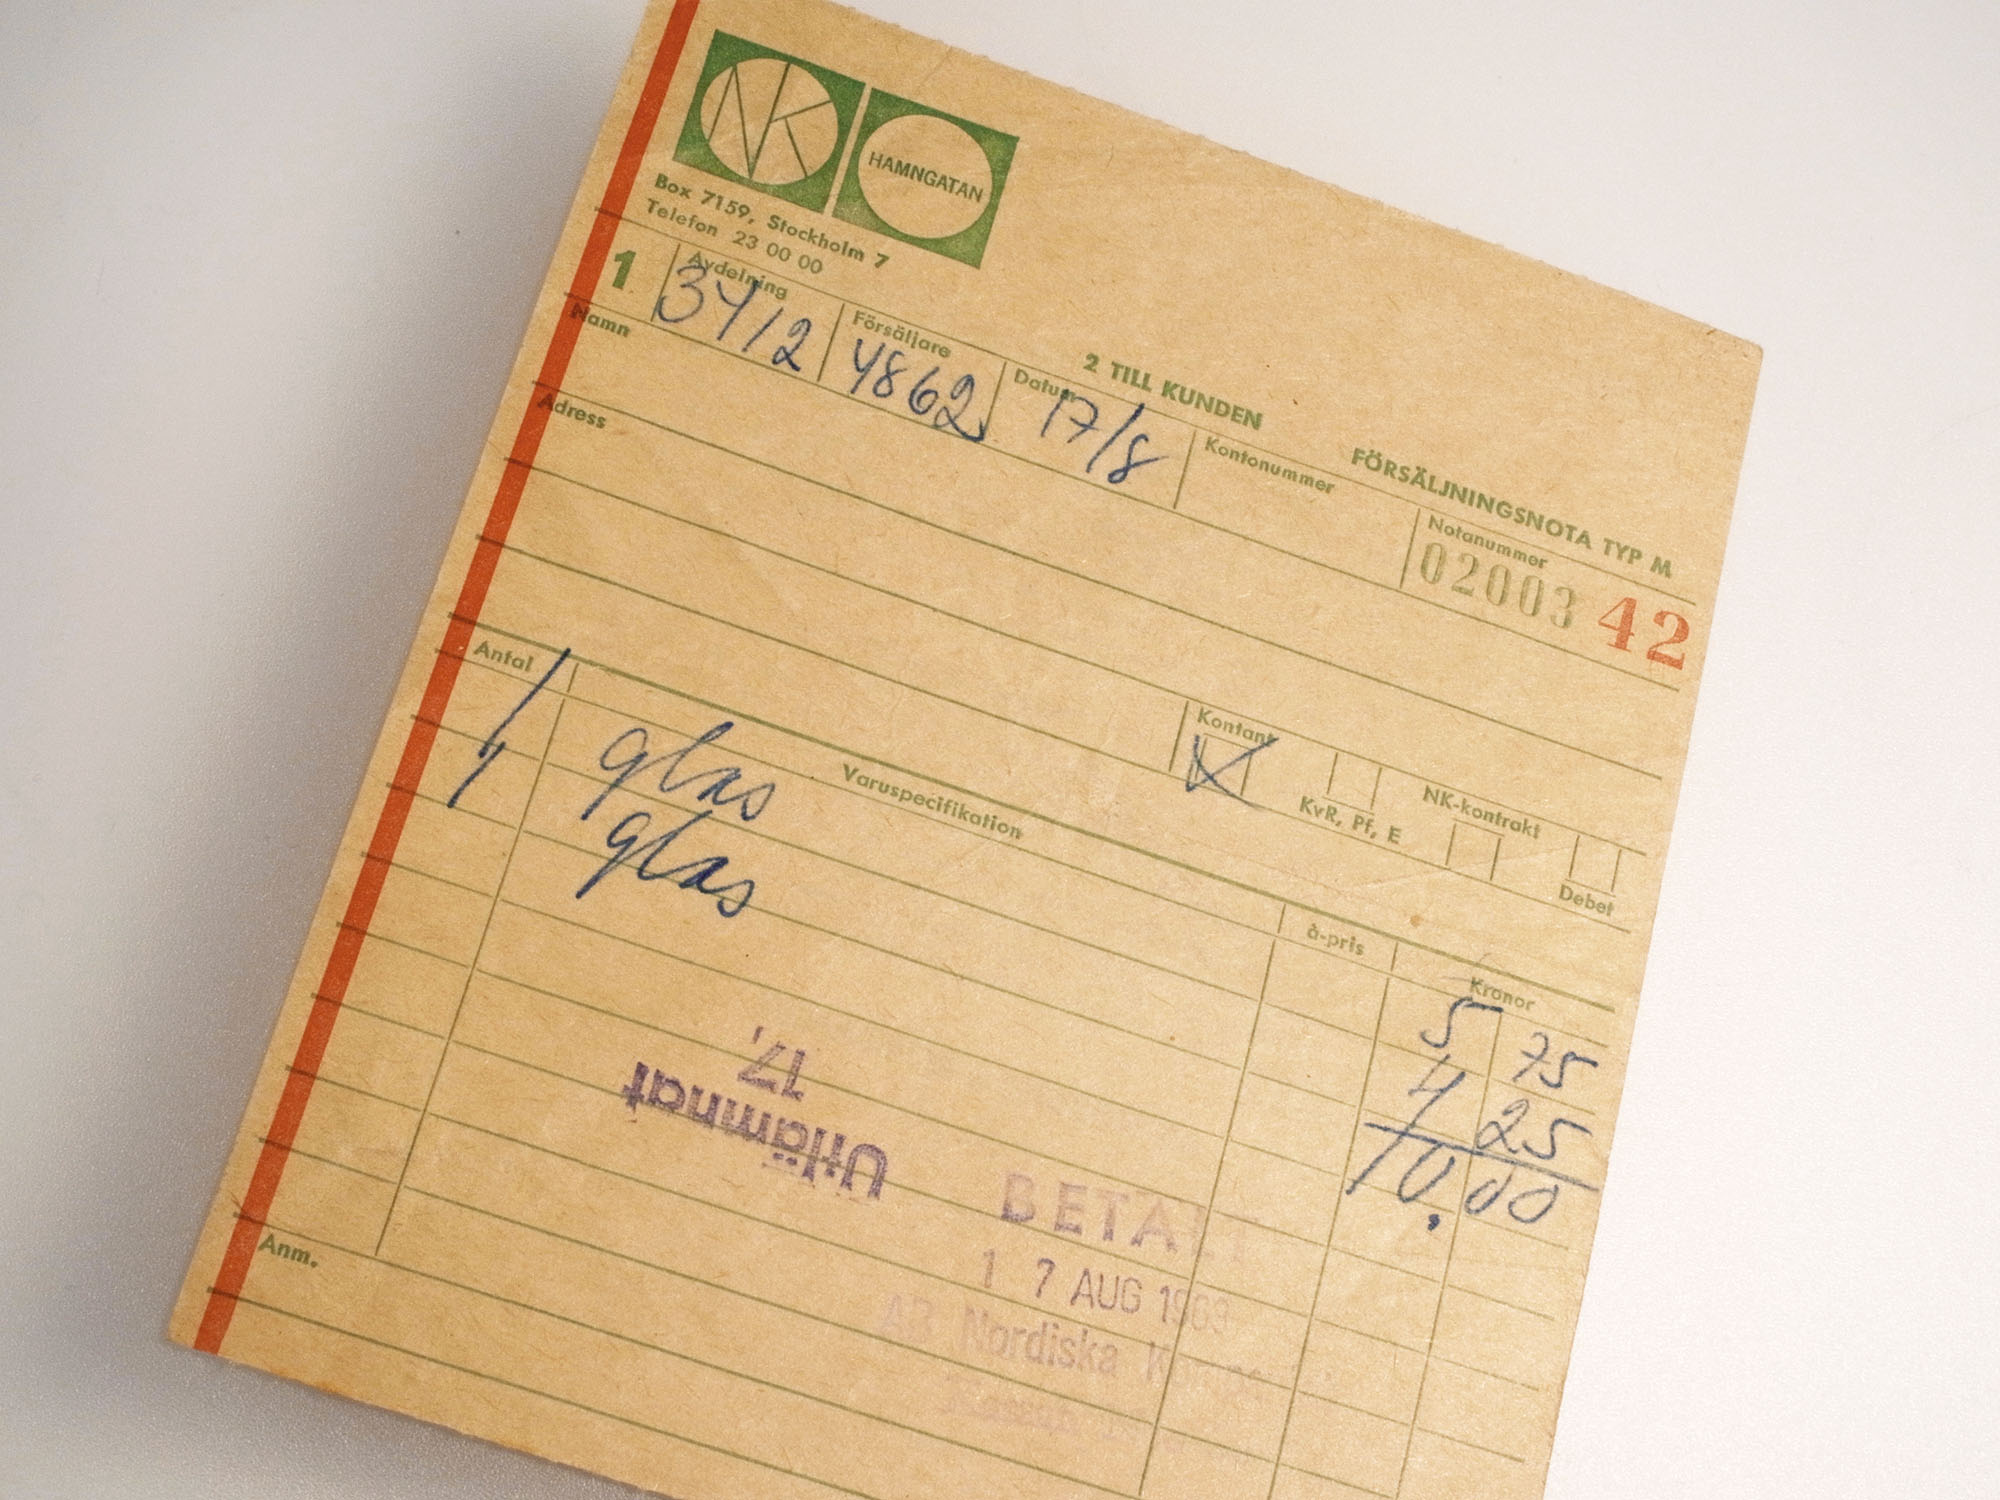 fuga orrefors ticket